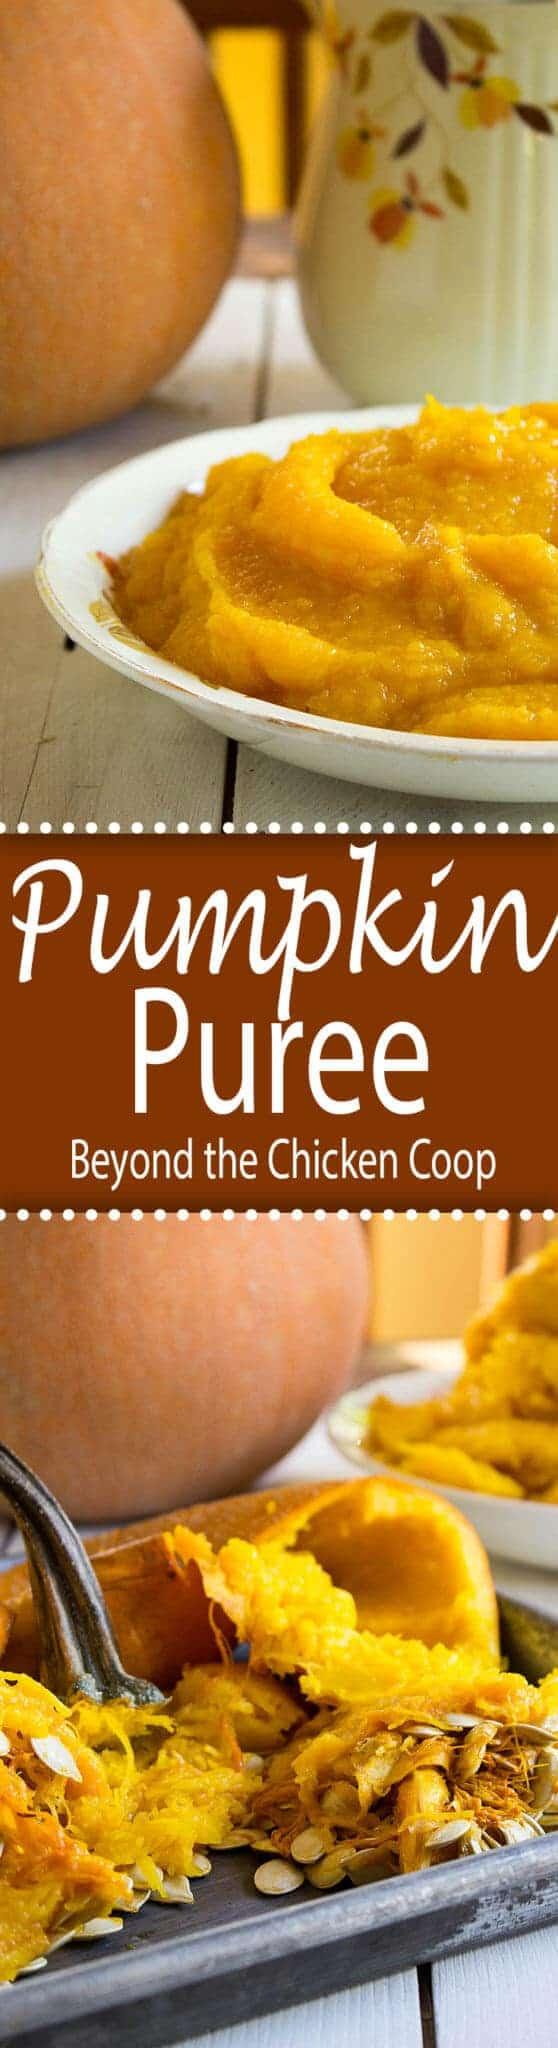 Pumpkin puree in a small bowl.